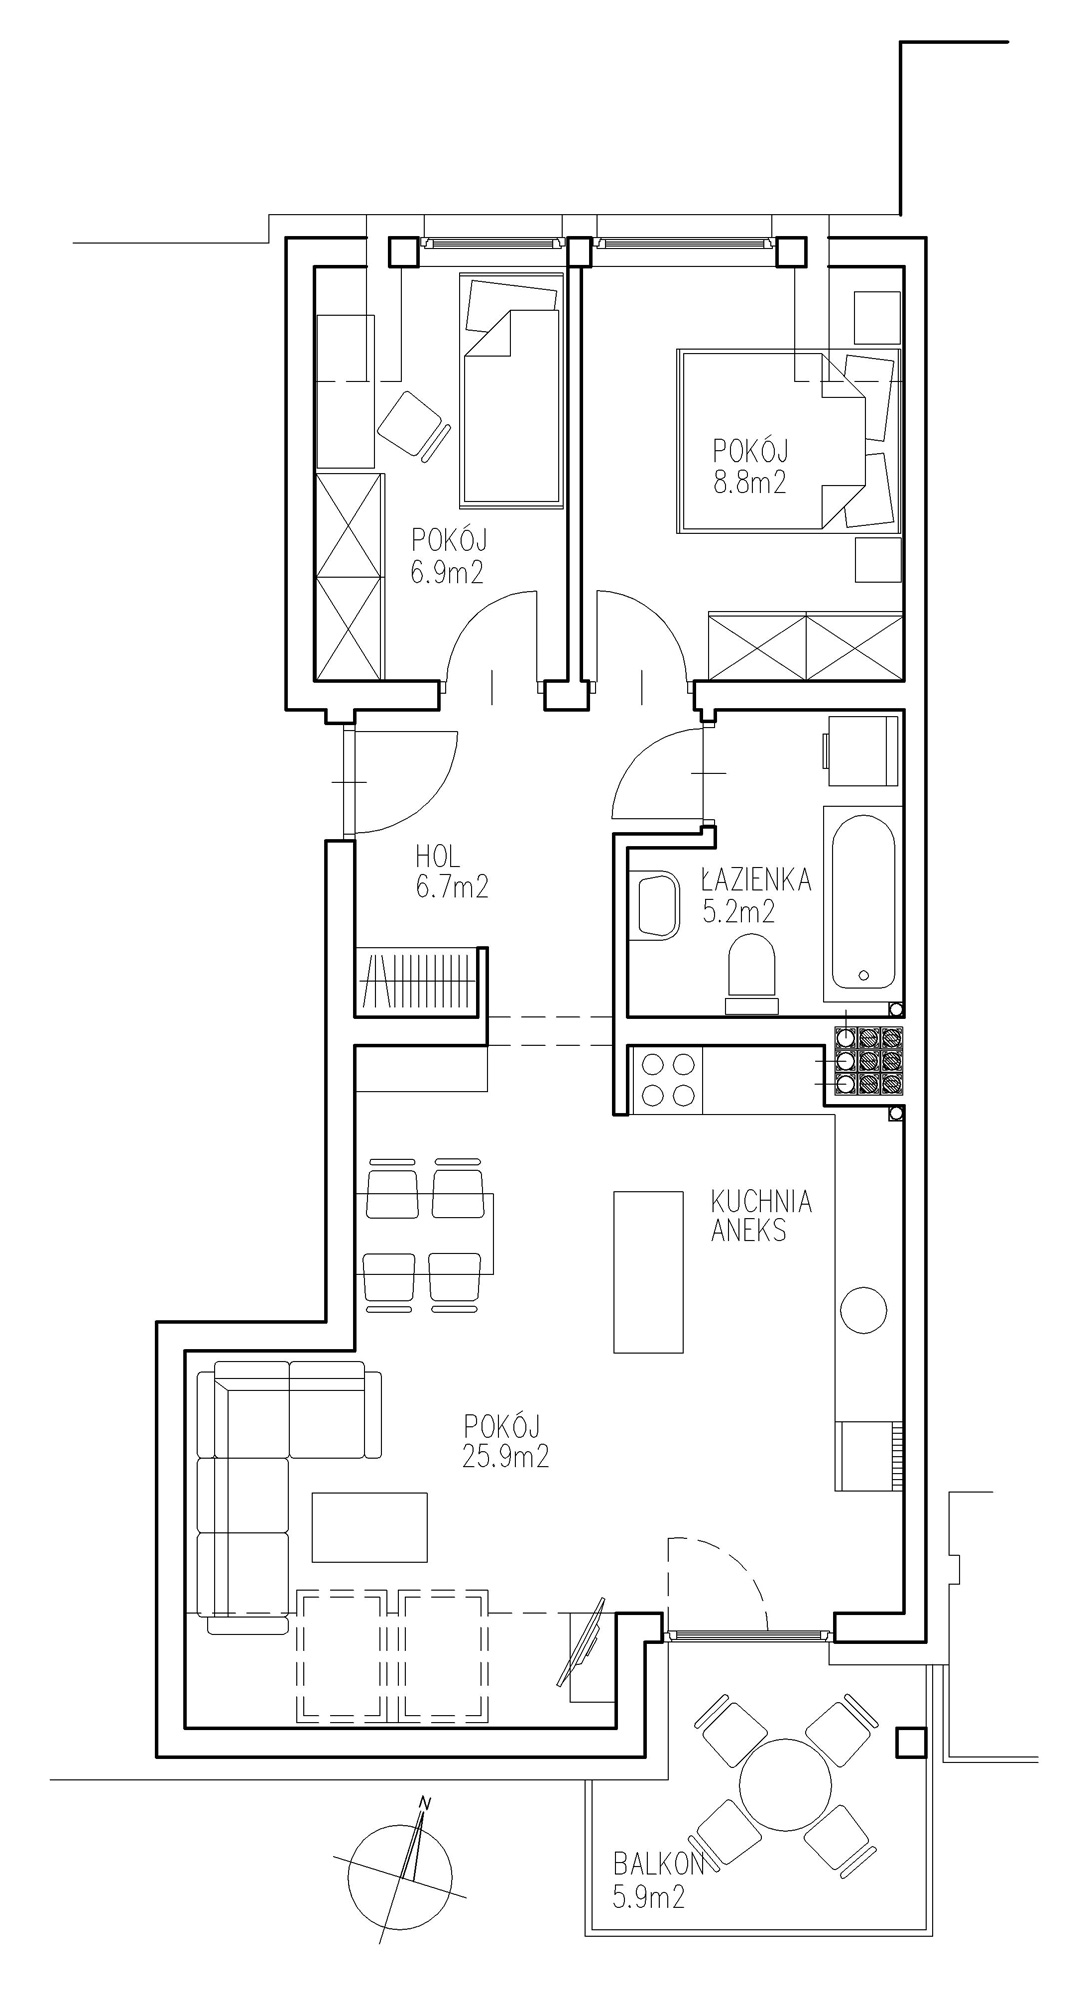 KTK Deweloper - Ełk - ul. Ogrodowa - Blok nr 2 - Mieszkanie nr 17